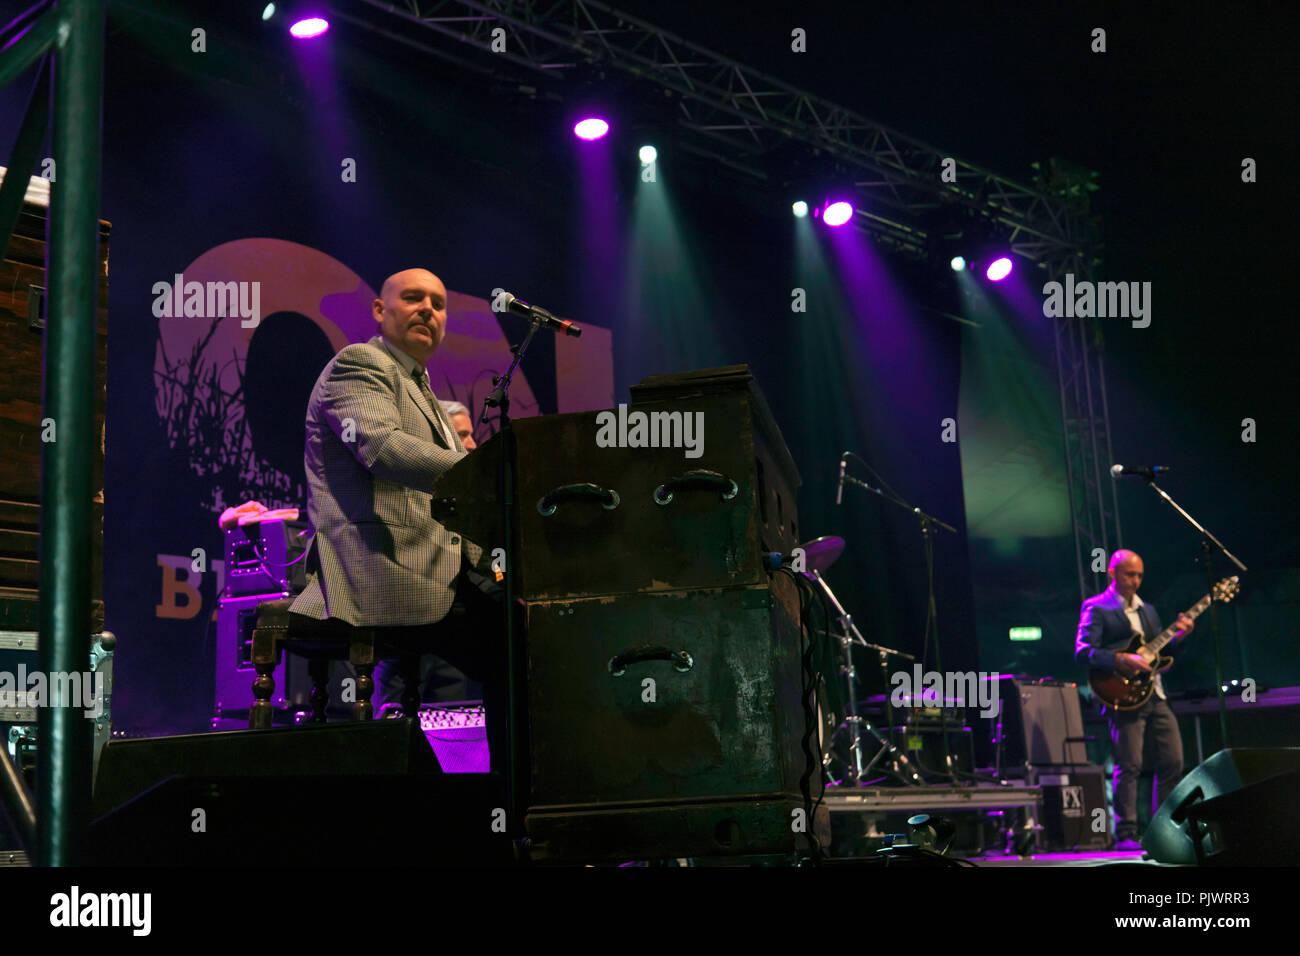 James Taylor Quartet on stage 2 of the OnBlackheath Music Festival, Lewisham, London - Stock Image